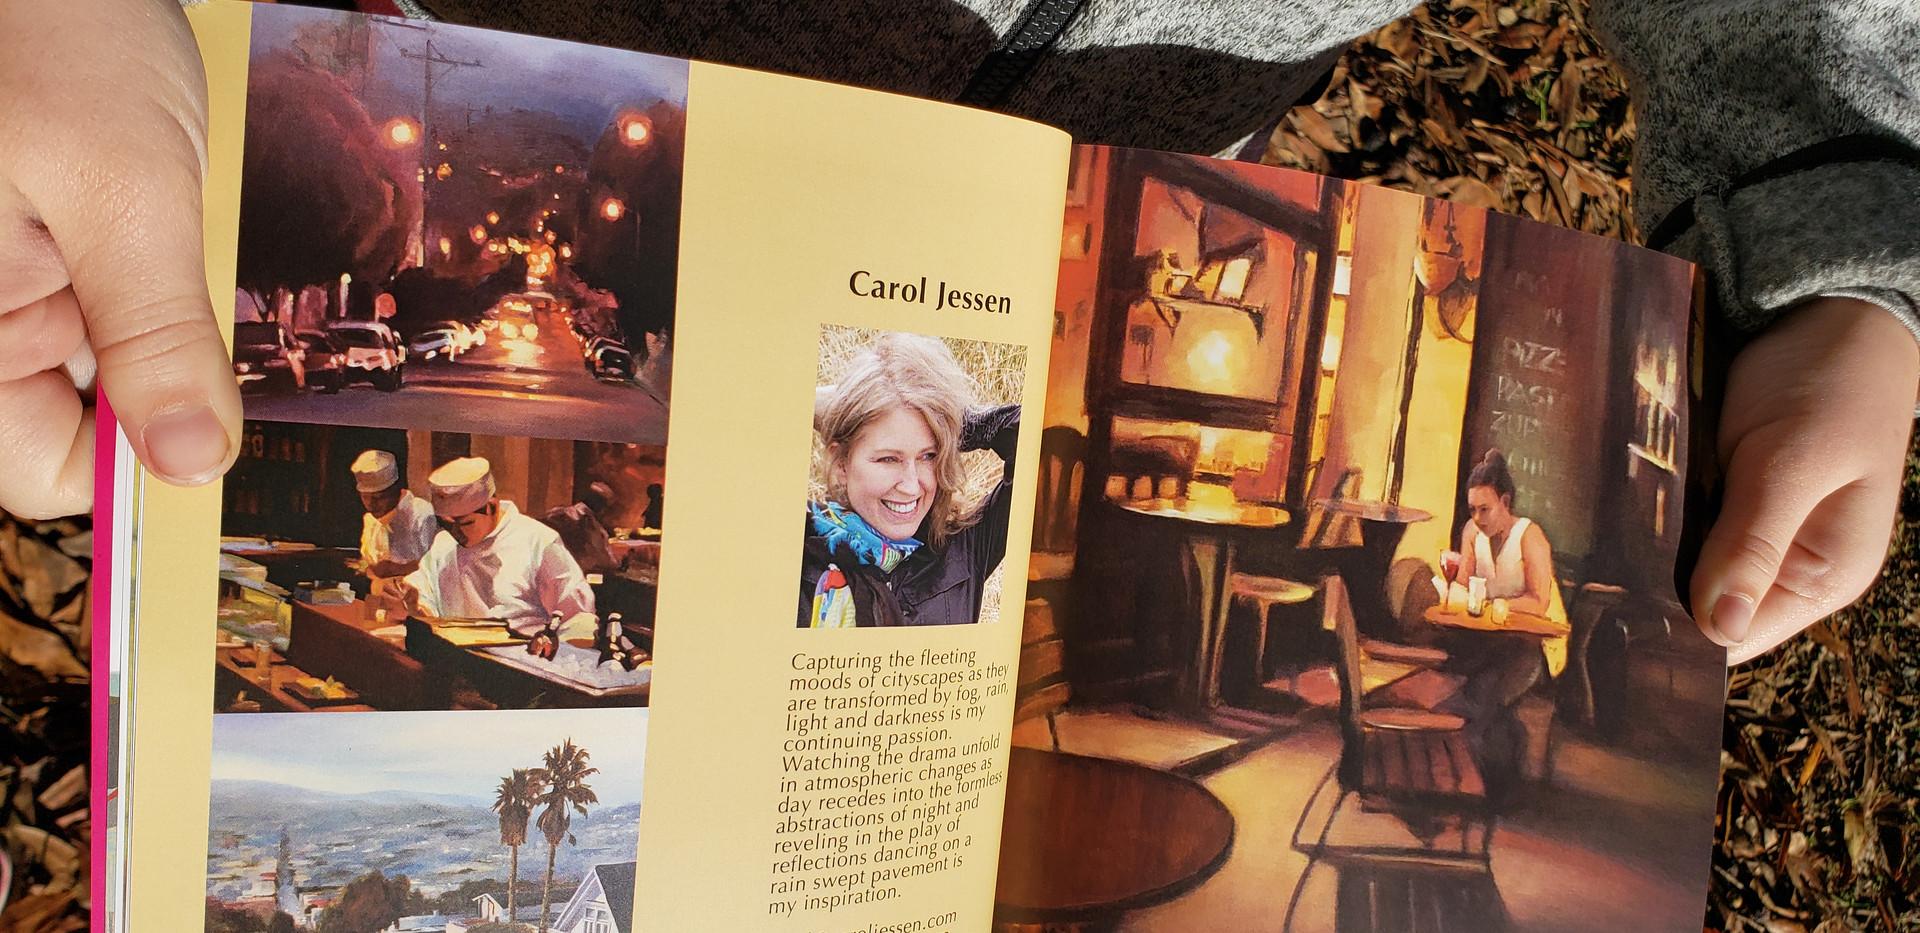 Carol Jessen